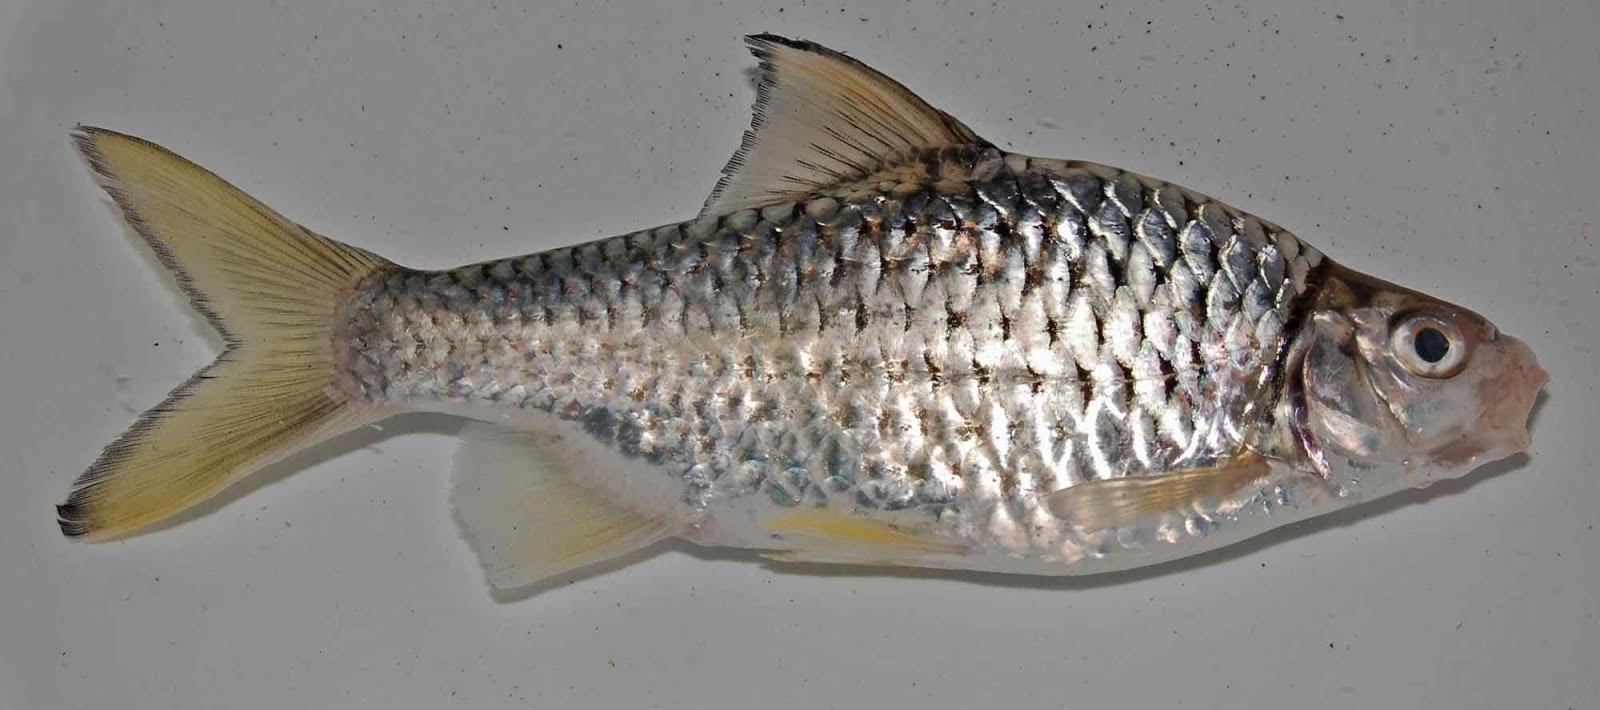 14 Umpan Mancing Ikan Wader Sungai Terbukti Sangat Ampuh